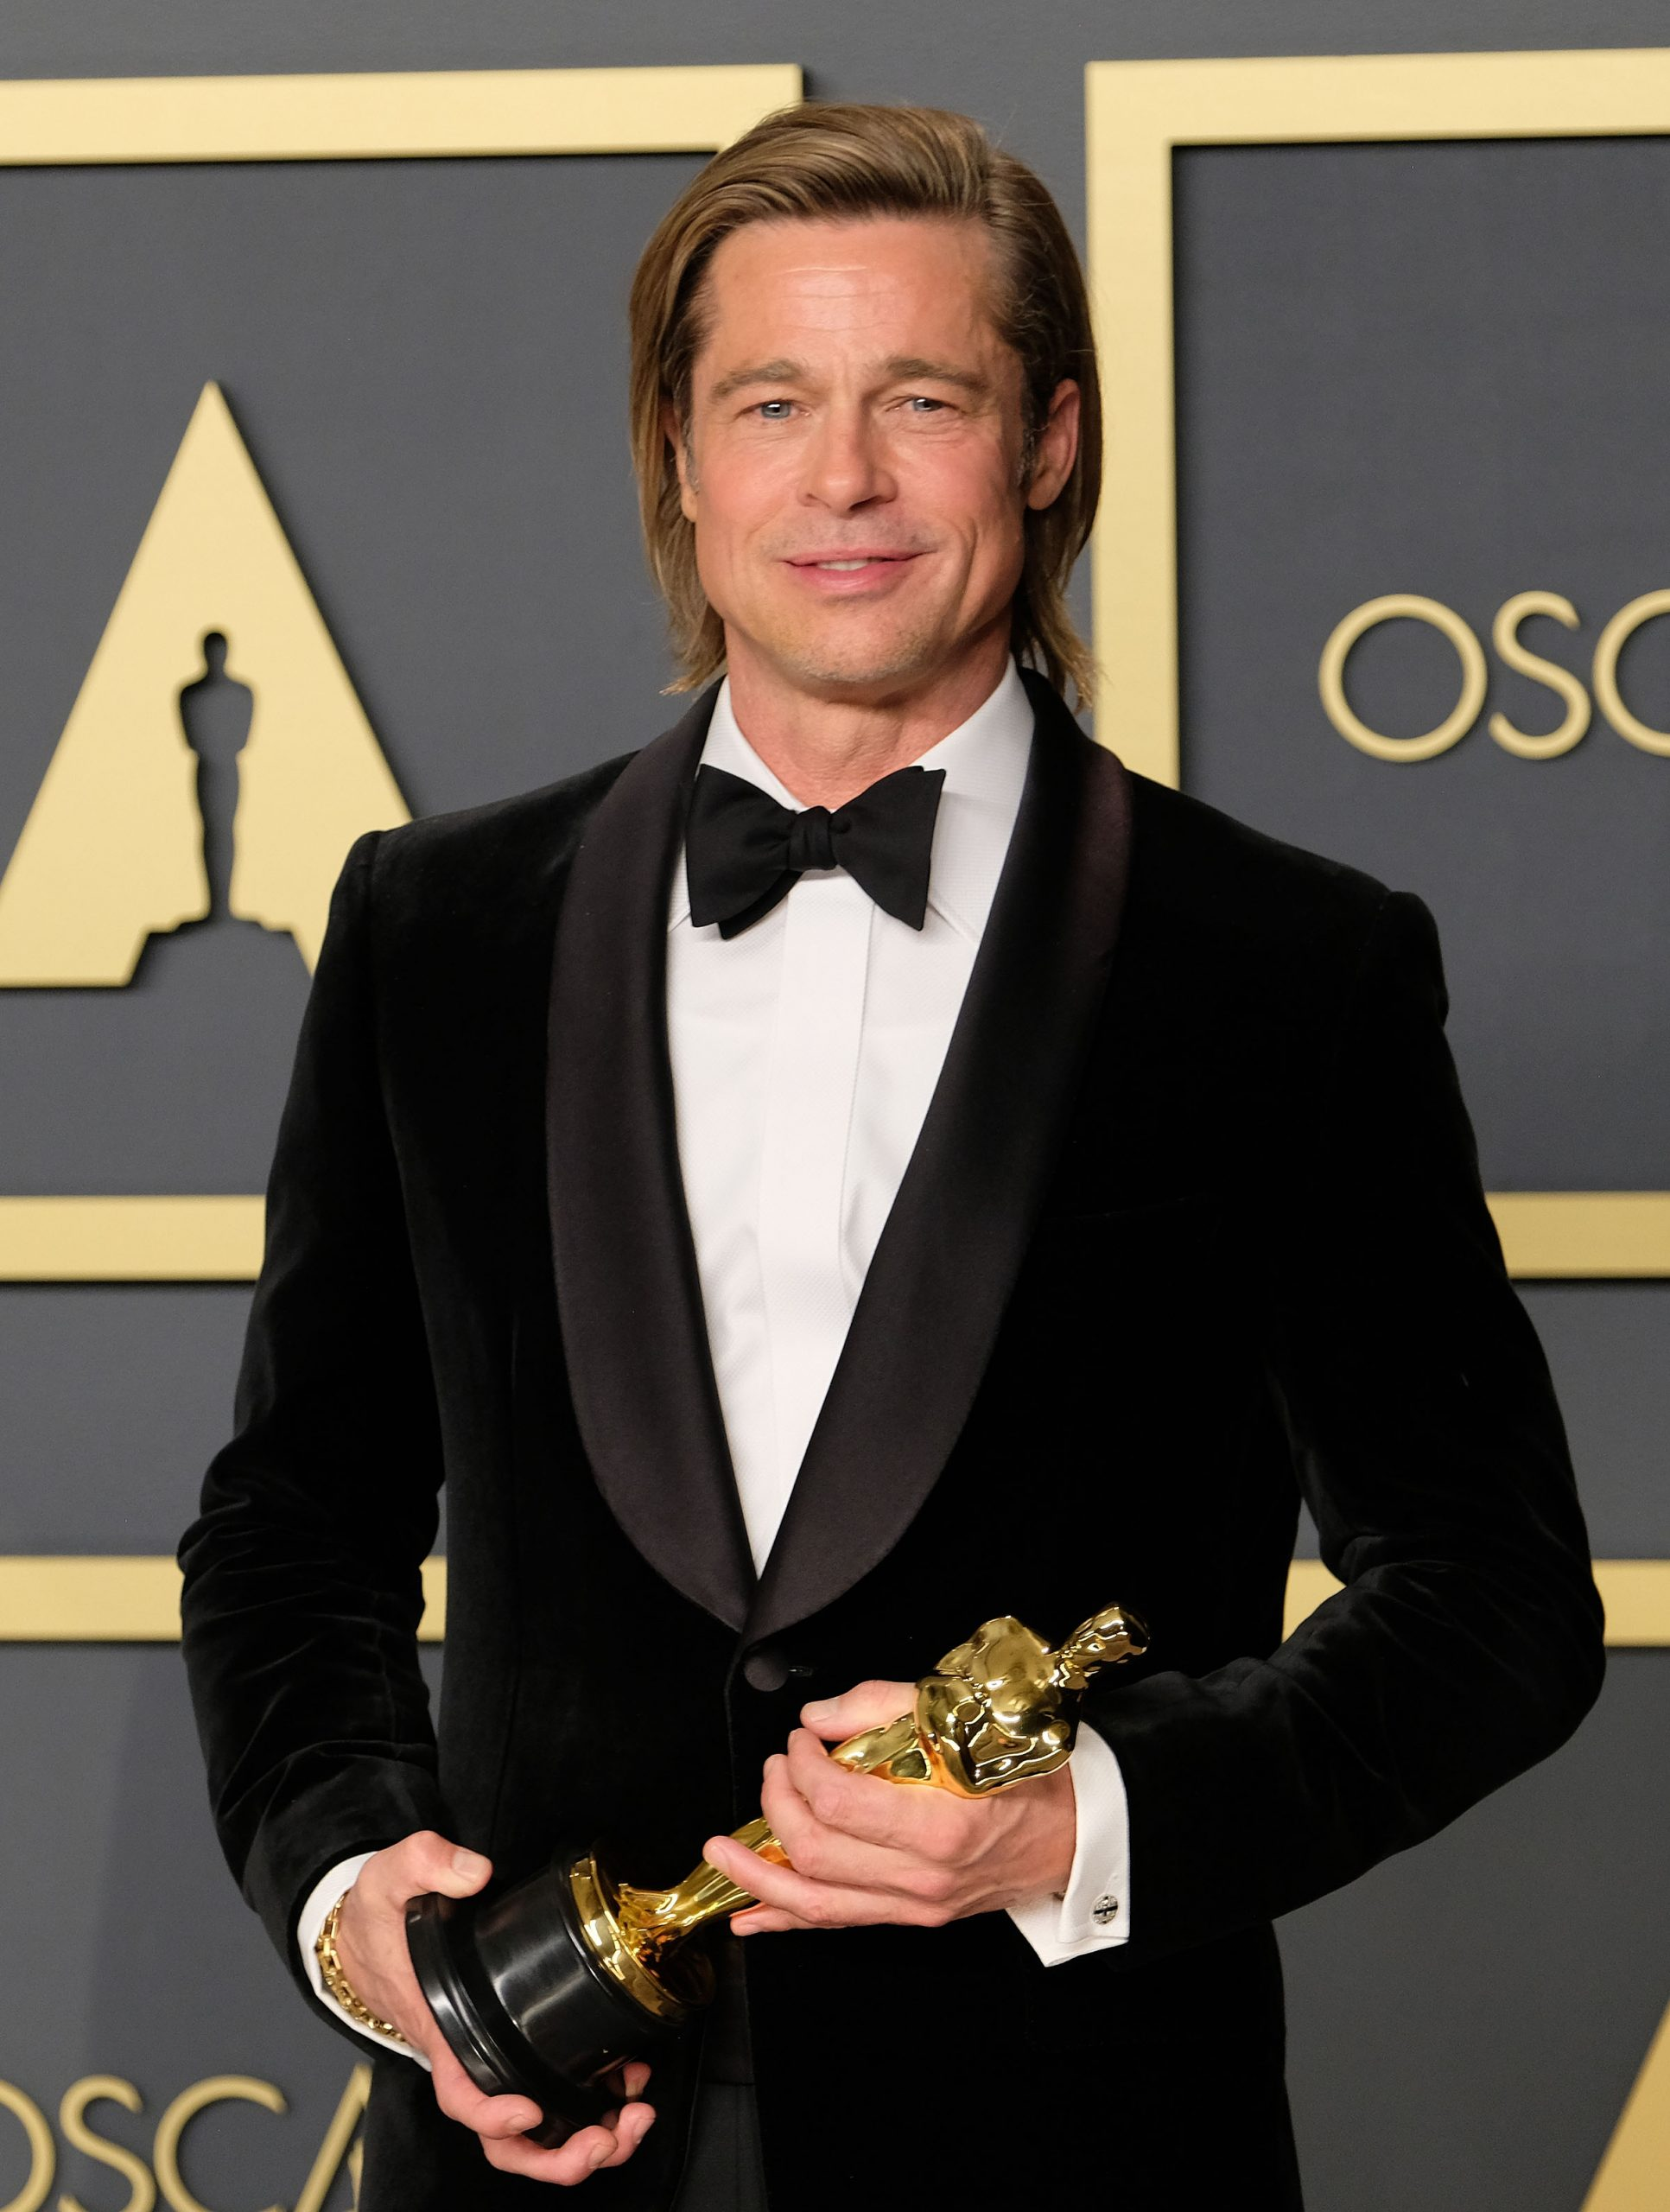 Brad Pitt wins Best Supporting Actor Oscar